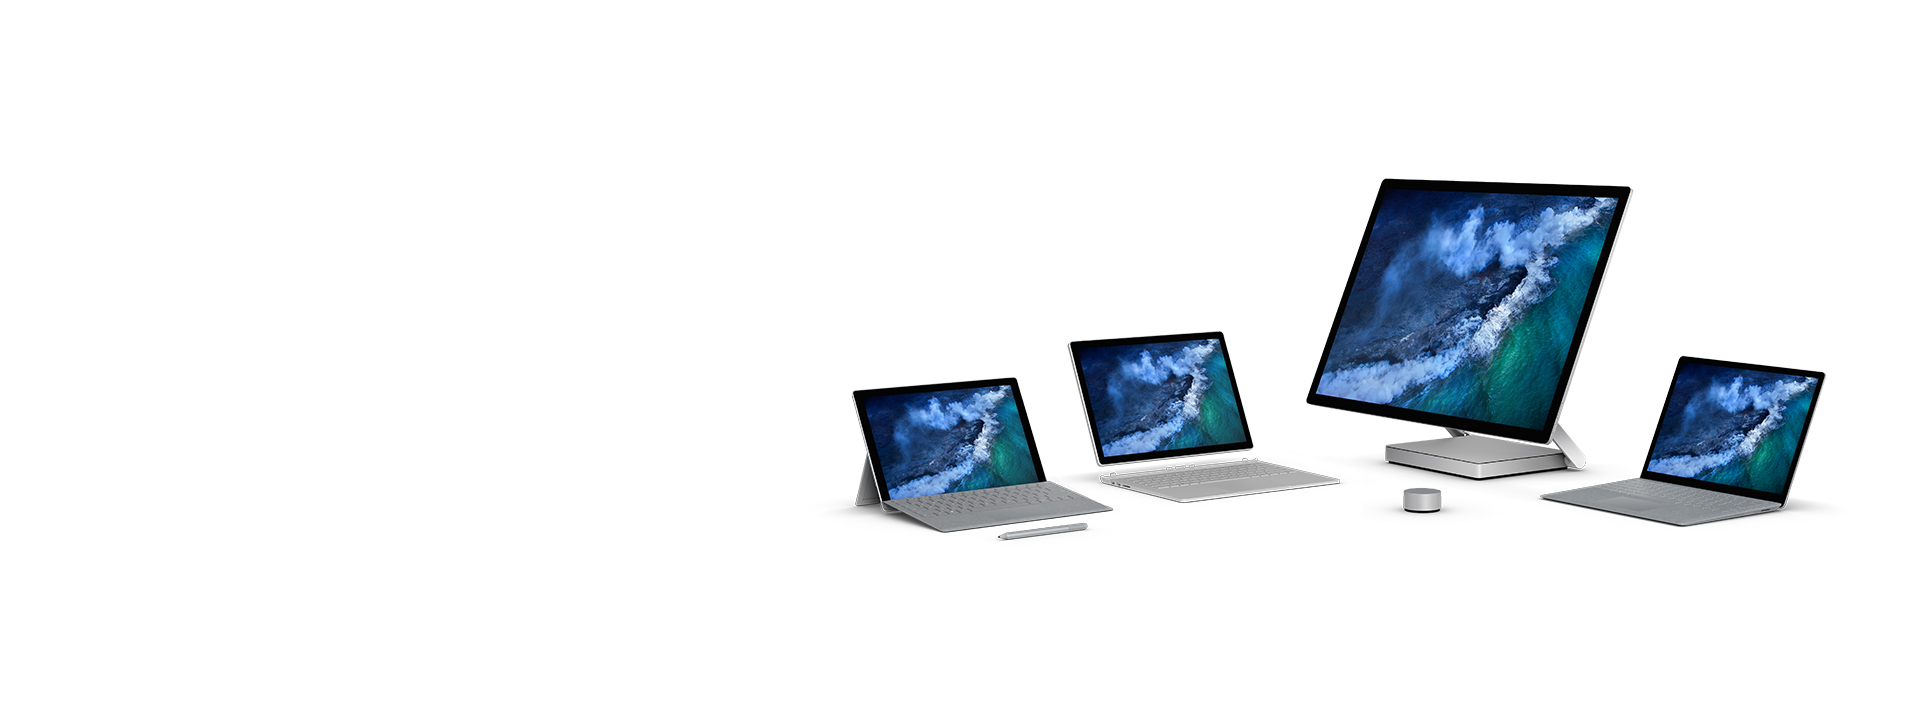 Surface-familien – Surface Pro, Surface Laptop, Surface Book 2 og Surface Studio